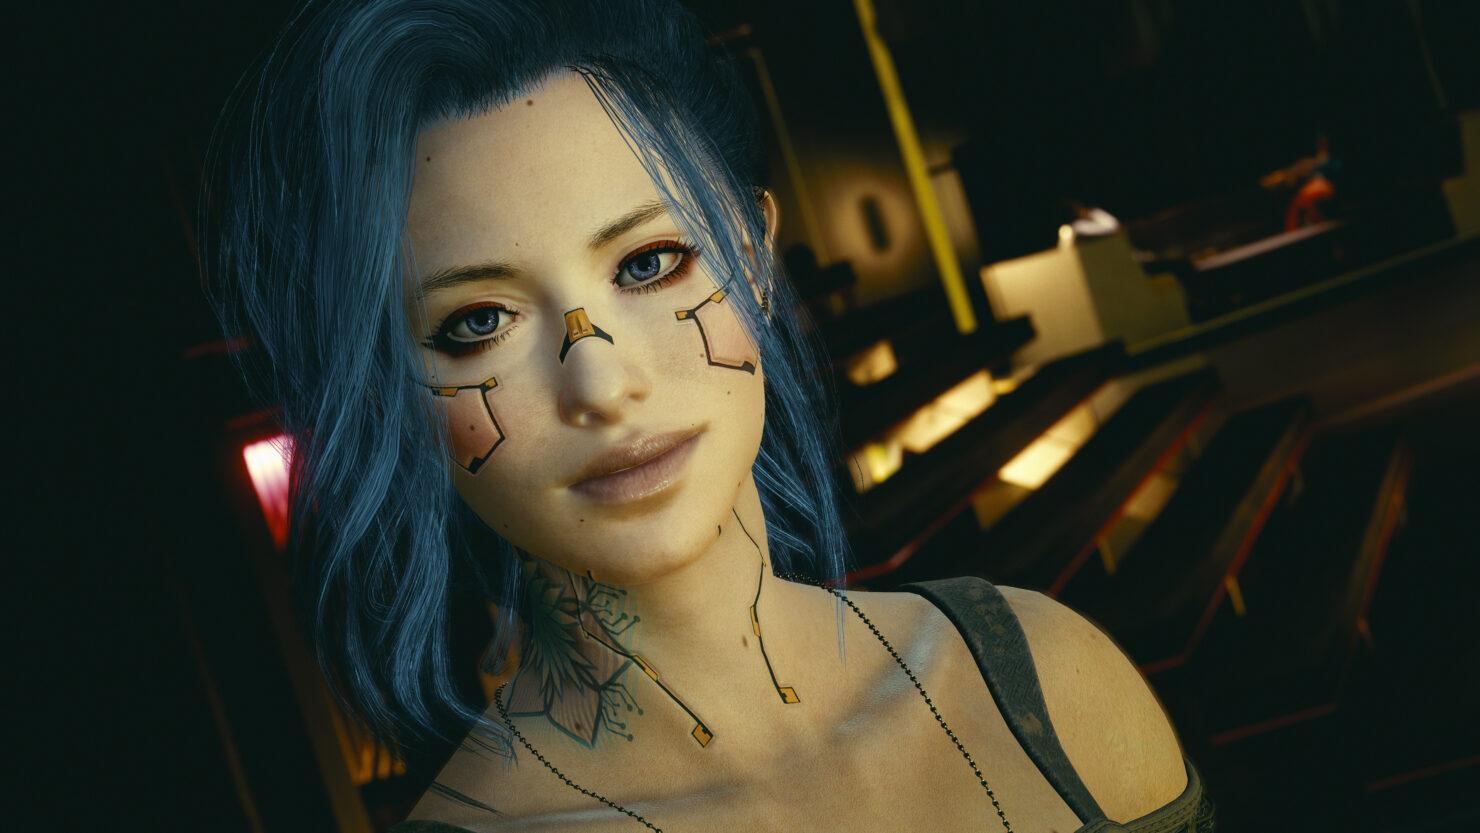 cyberpunk-hair-mods-claire-ponytail-6